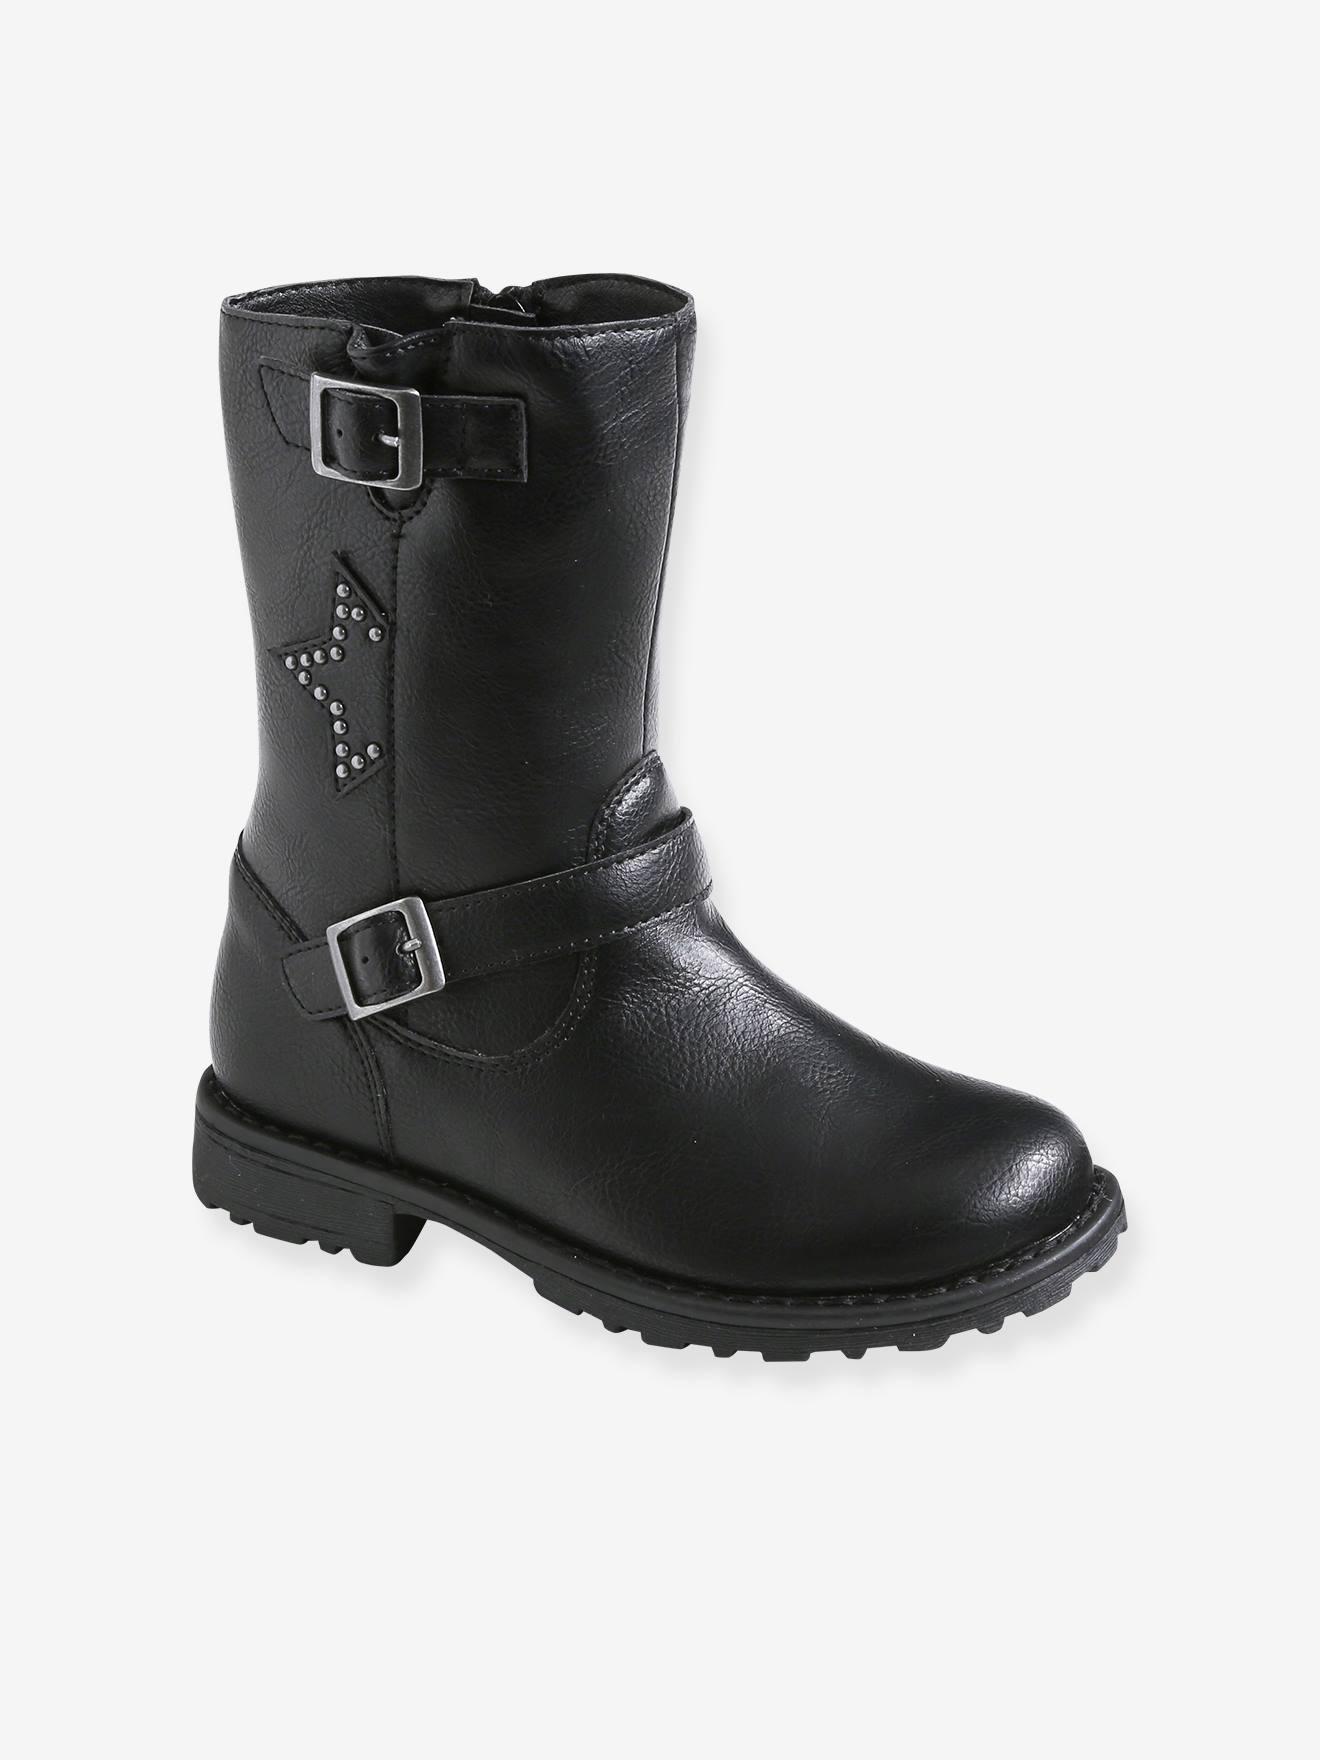 Biker-Style Boots, for Girls - black